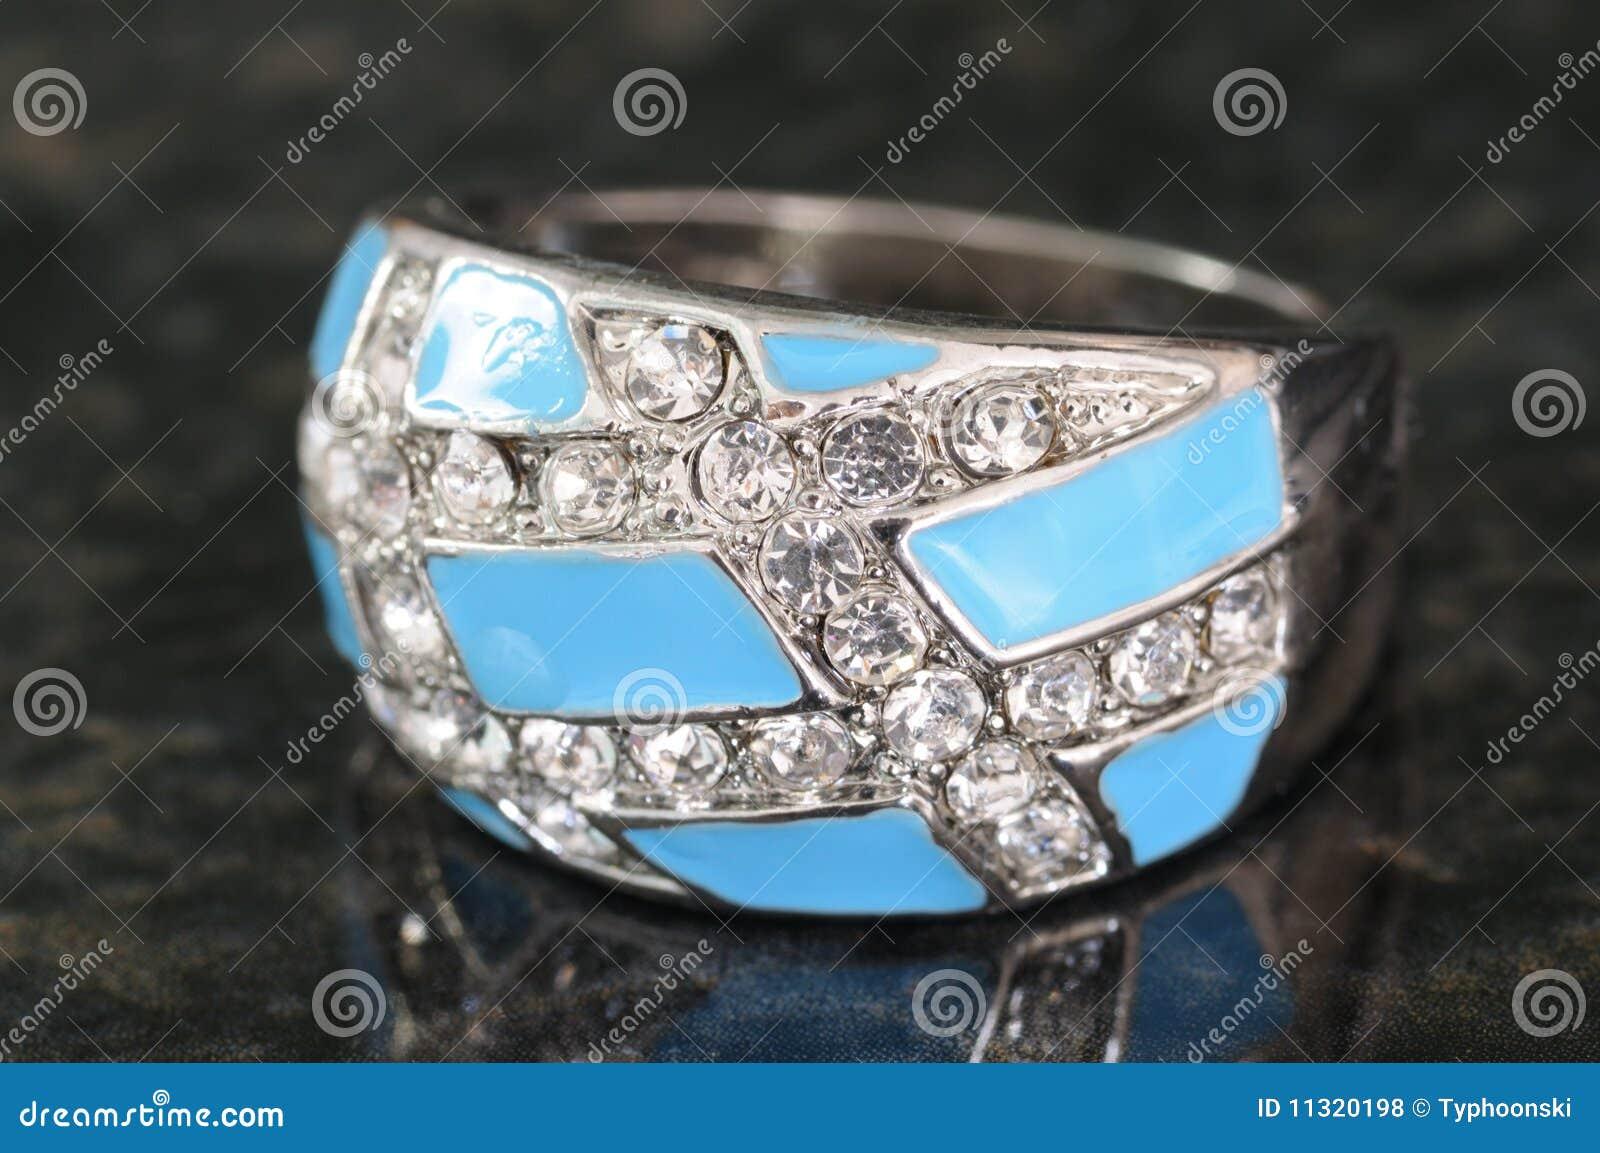 Nahaufnahme eines Ringes